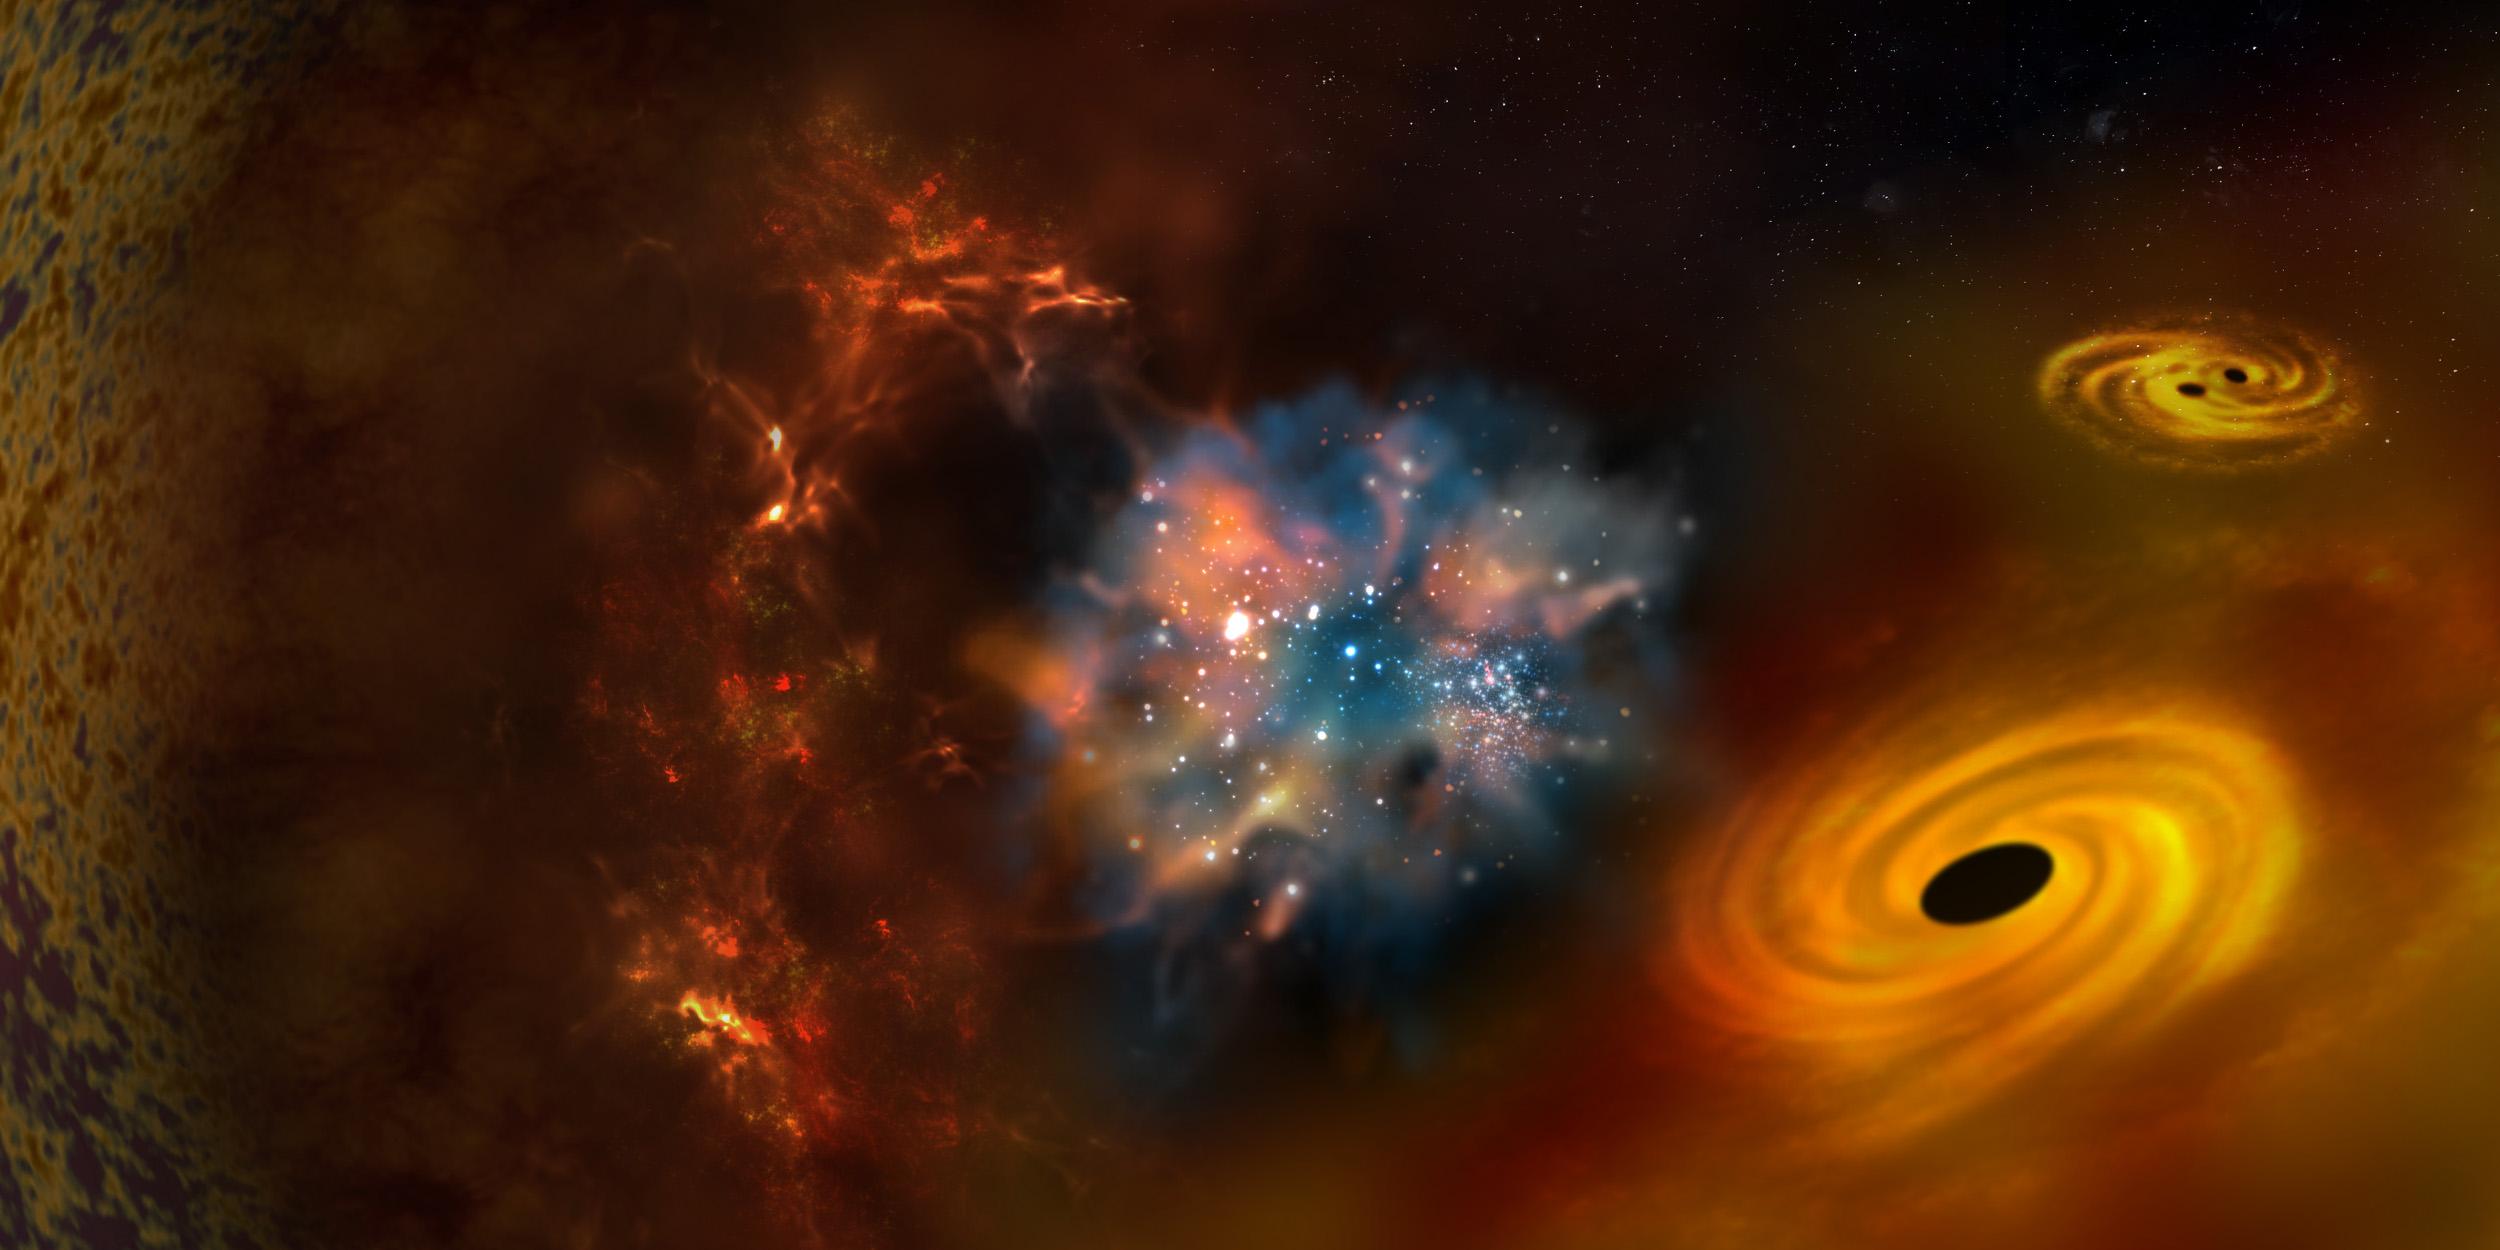 Voyage_2050_Early_Universe.jpg